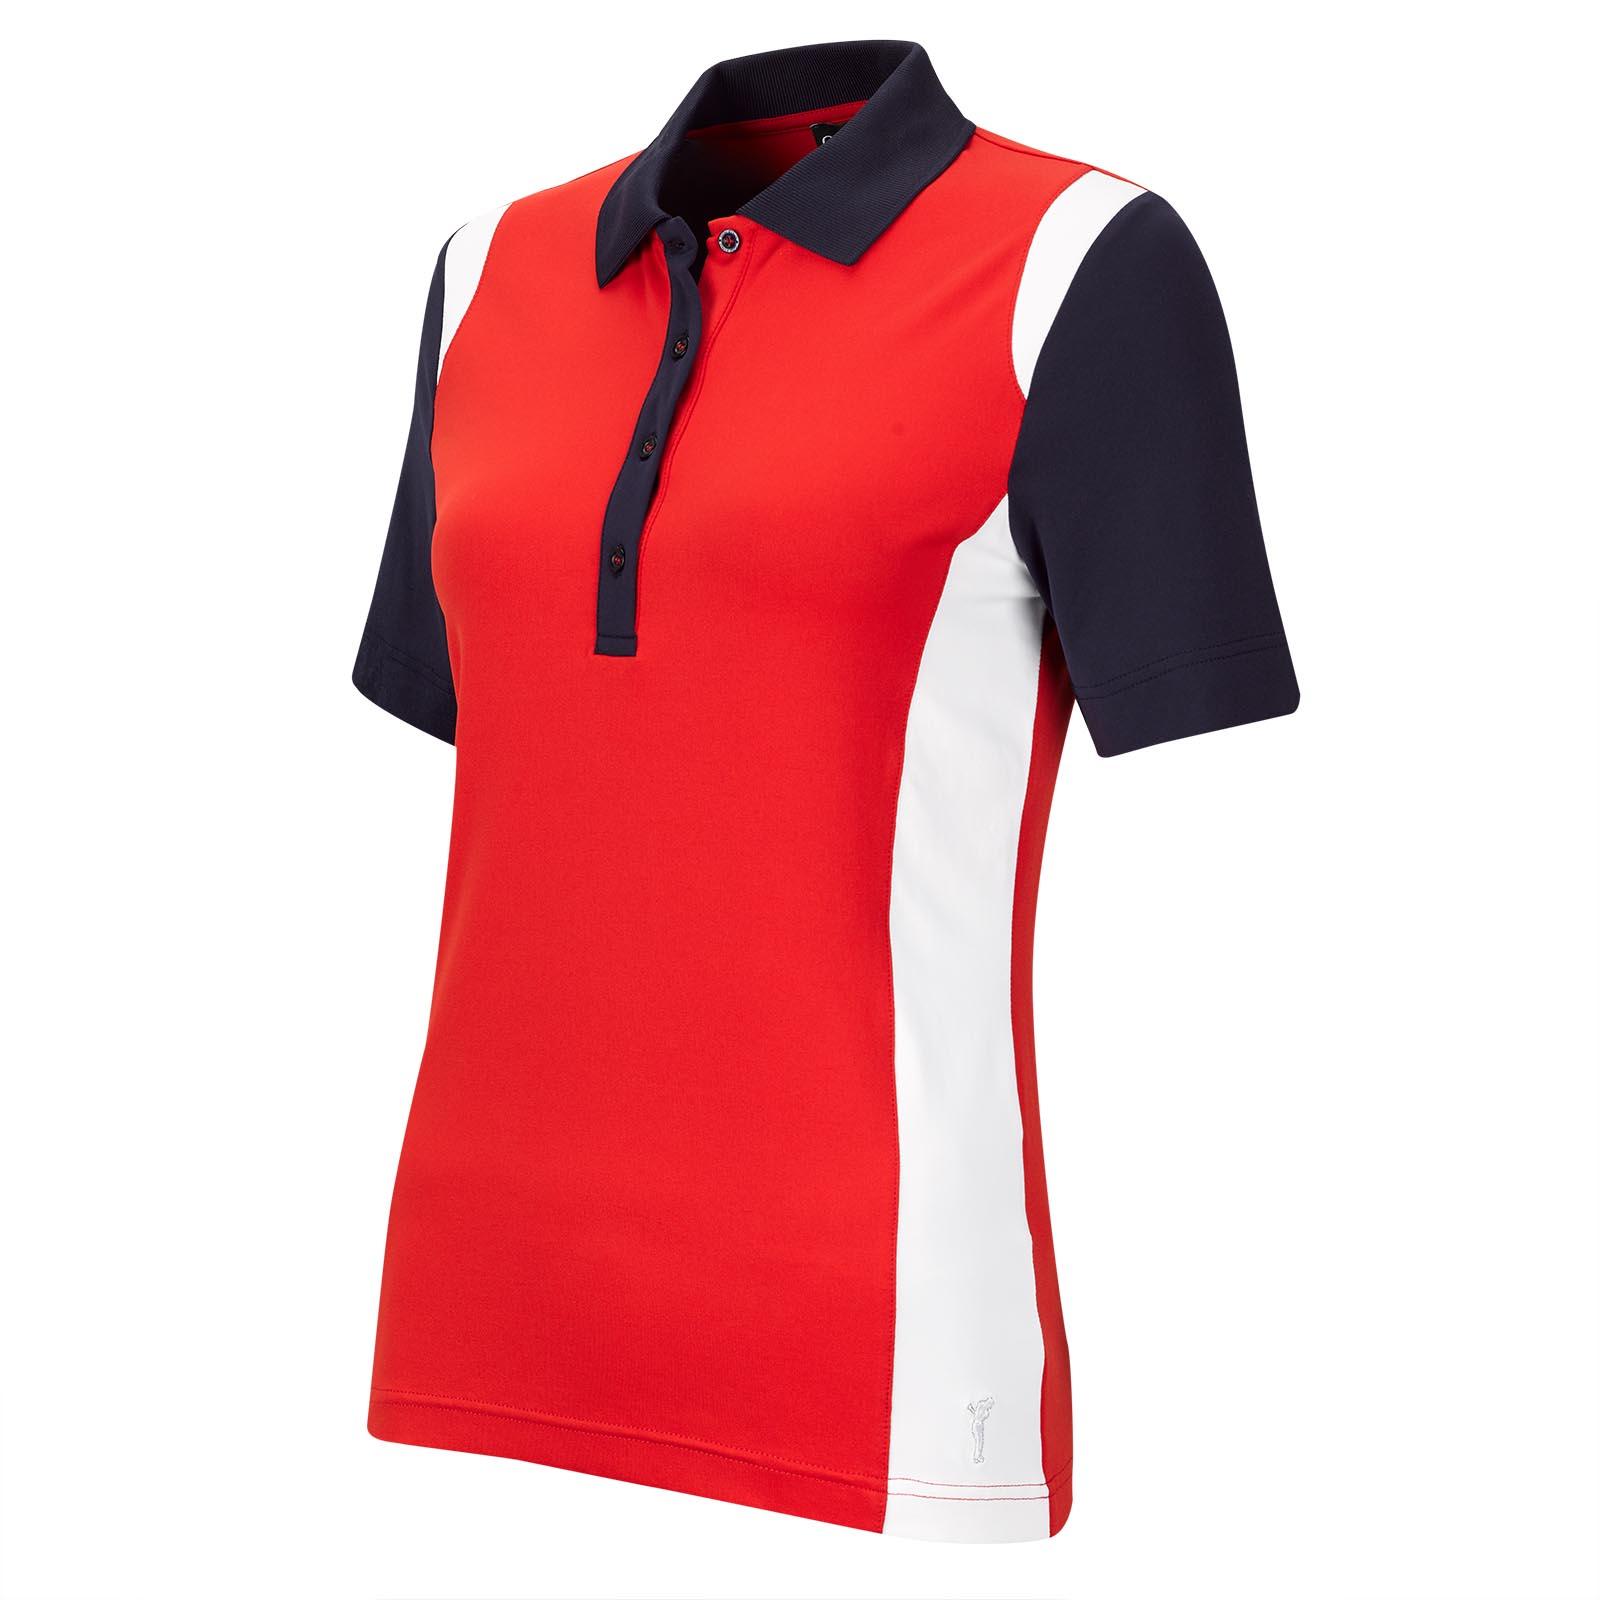 Kurzarm Damen Funktions-Golfpolo mit Moisture Management im Pro Look